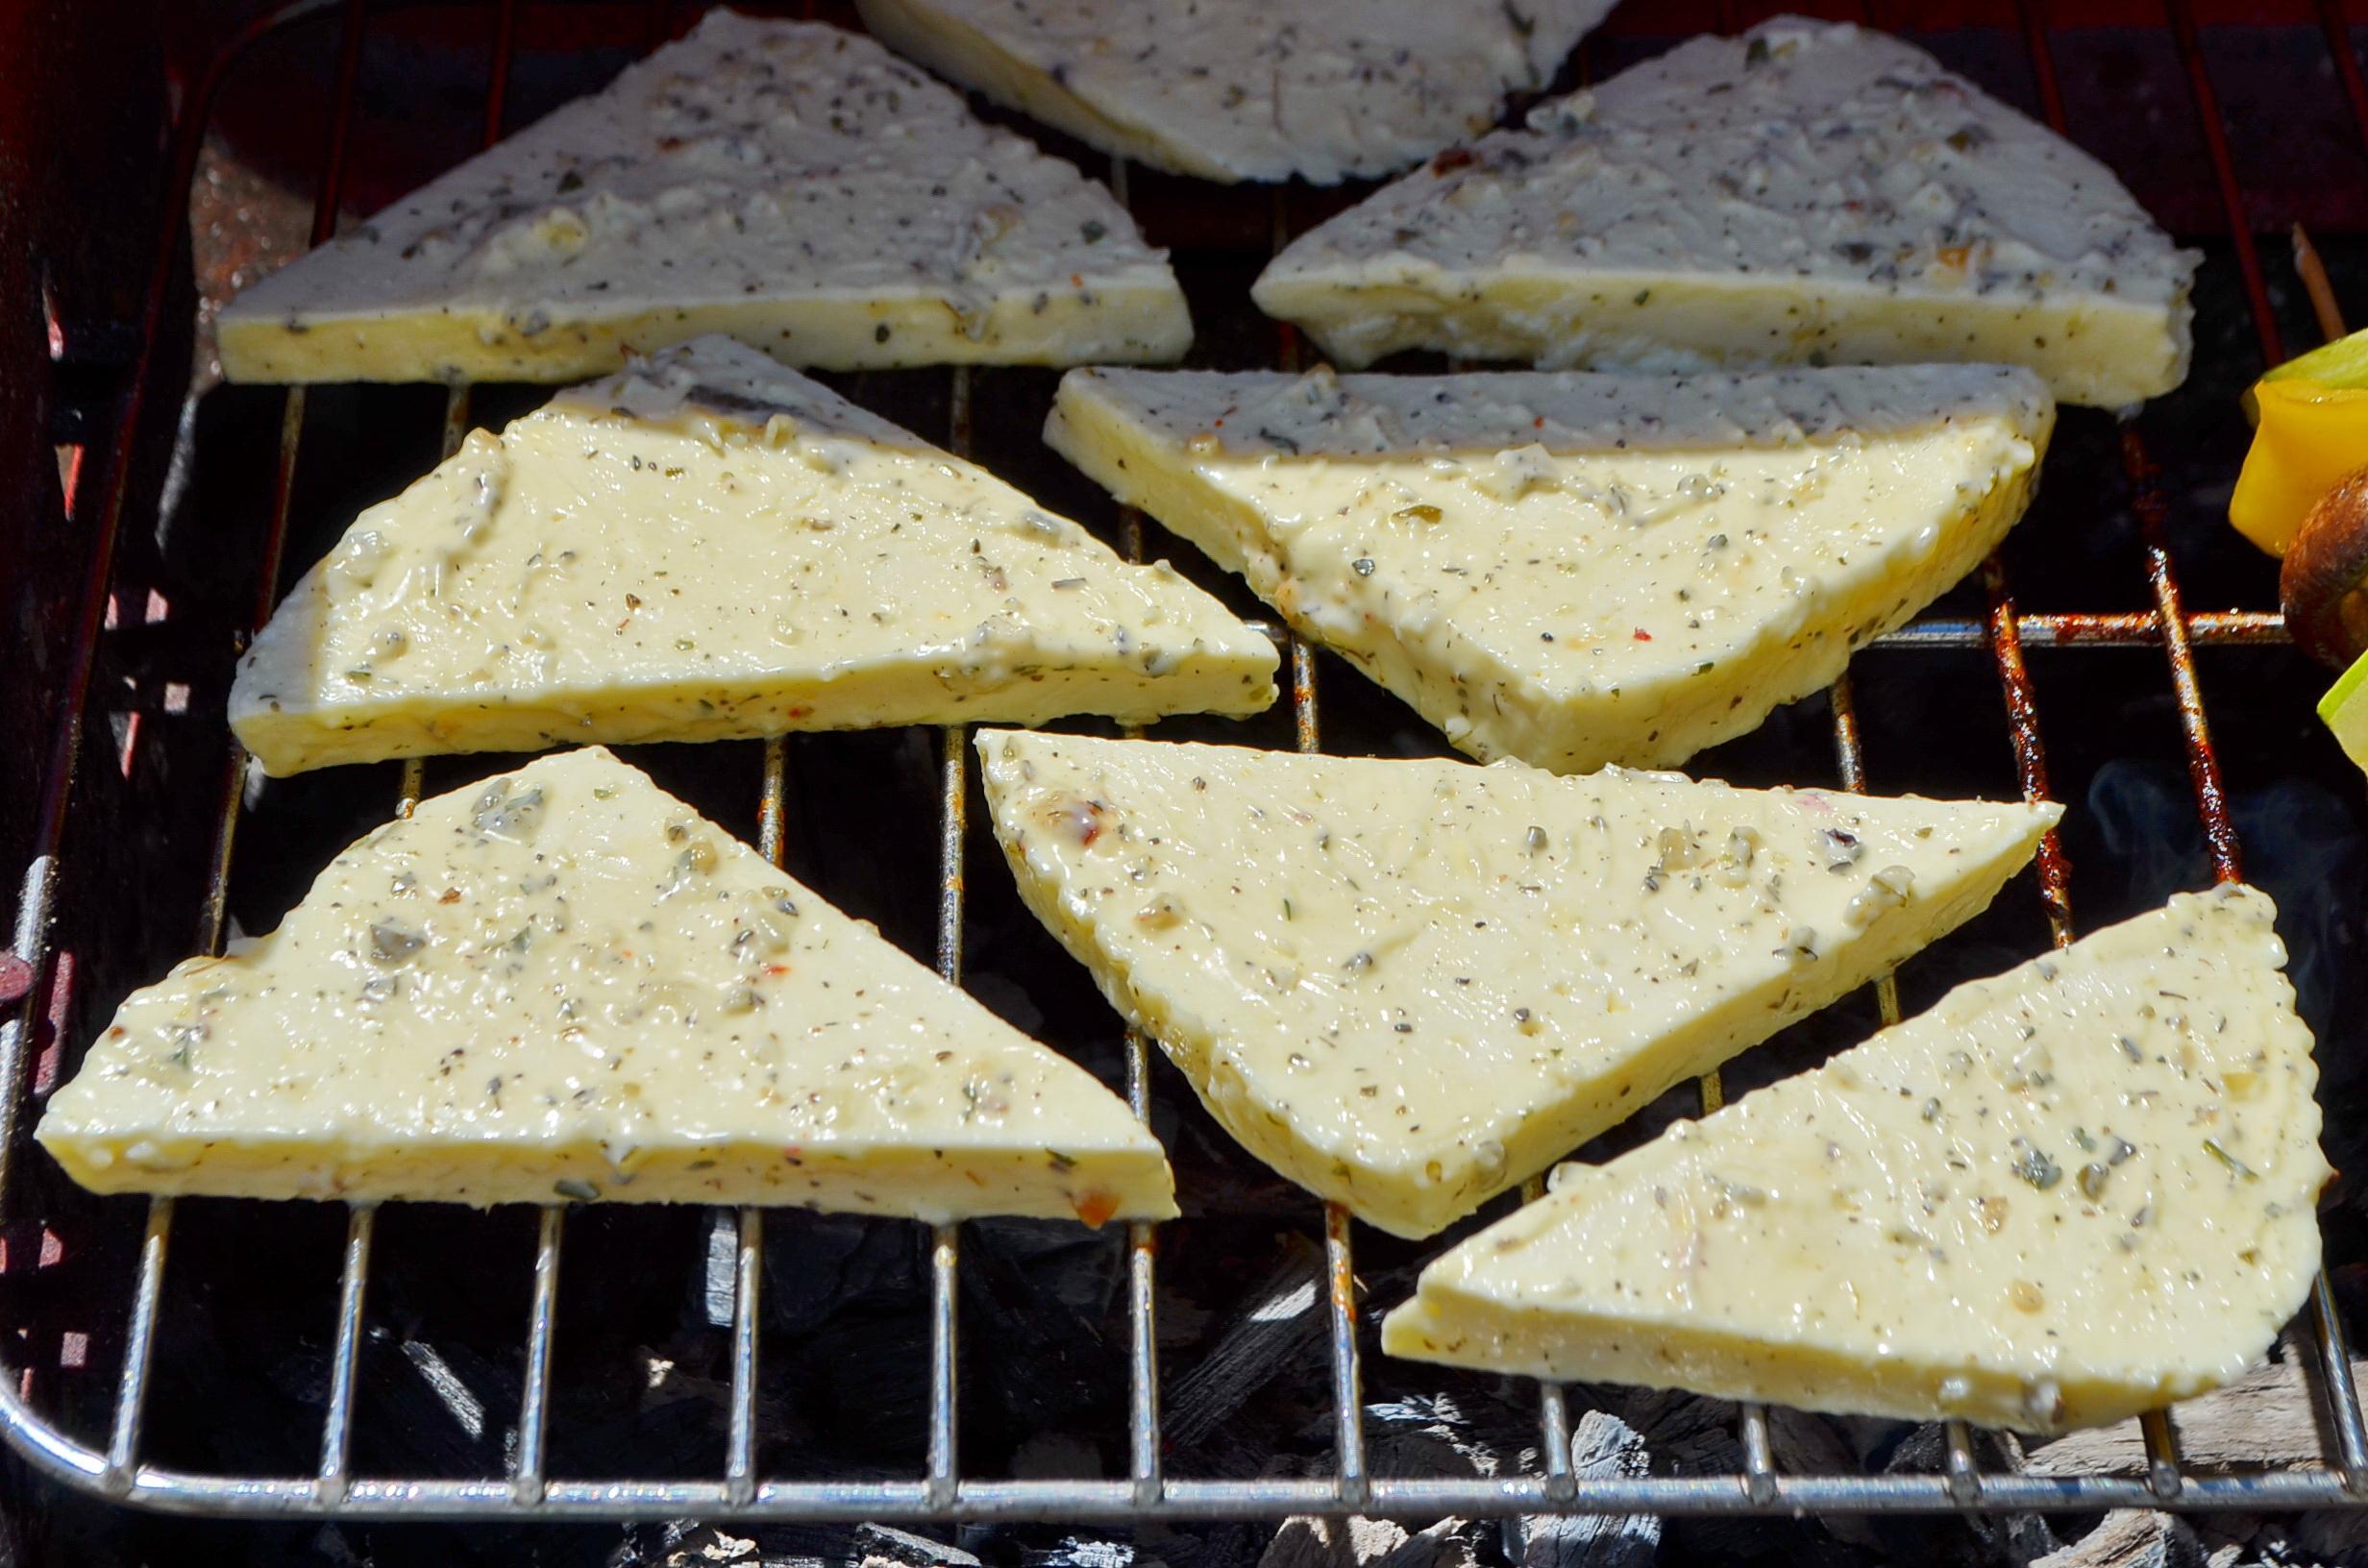 Сыр на мангале, шаг 3: жарим сыр на мангале